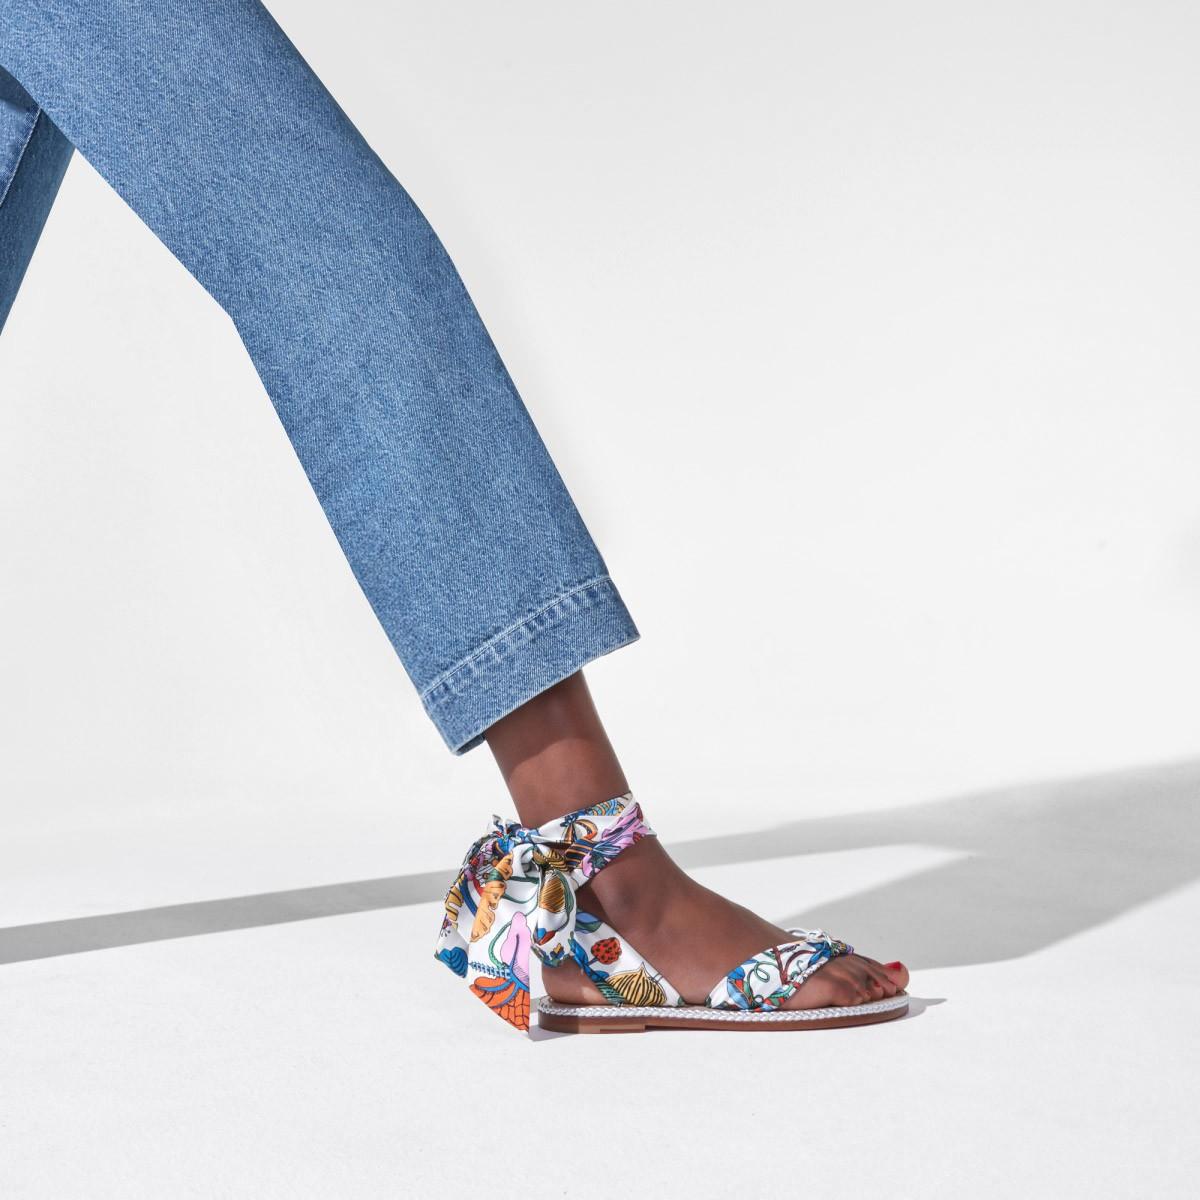 Shoes - Spetsos - Christian Louboutin